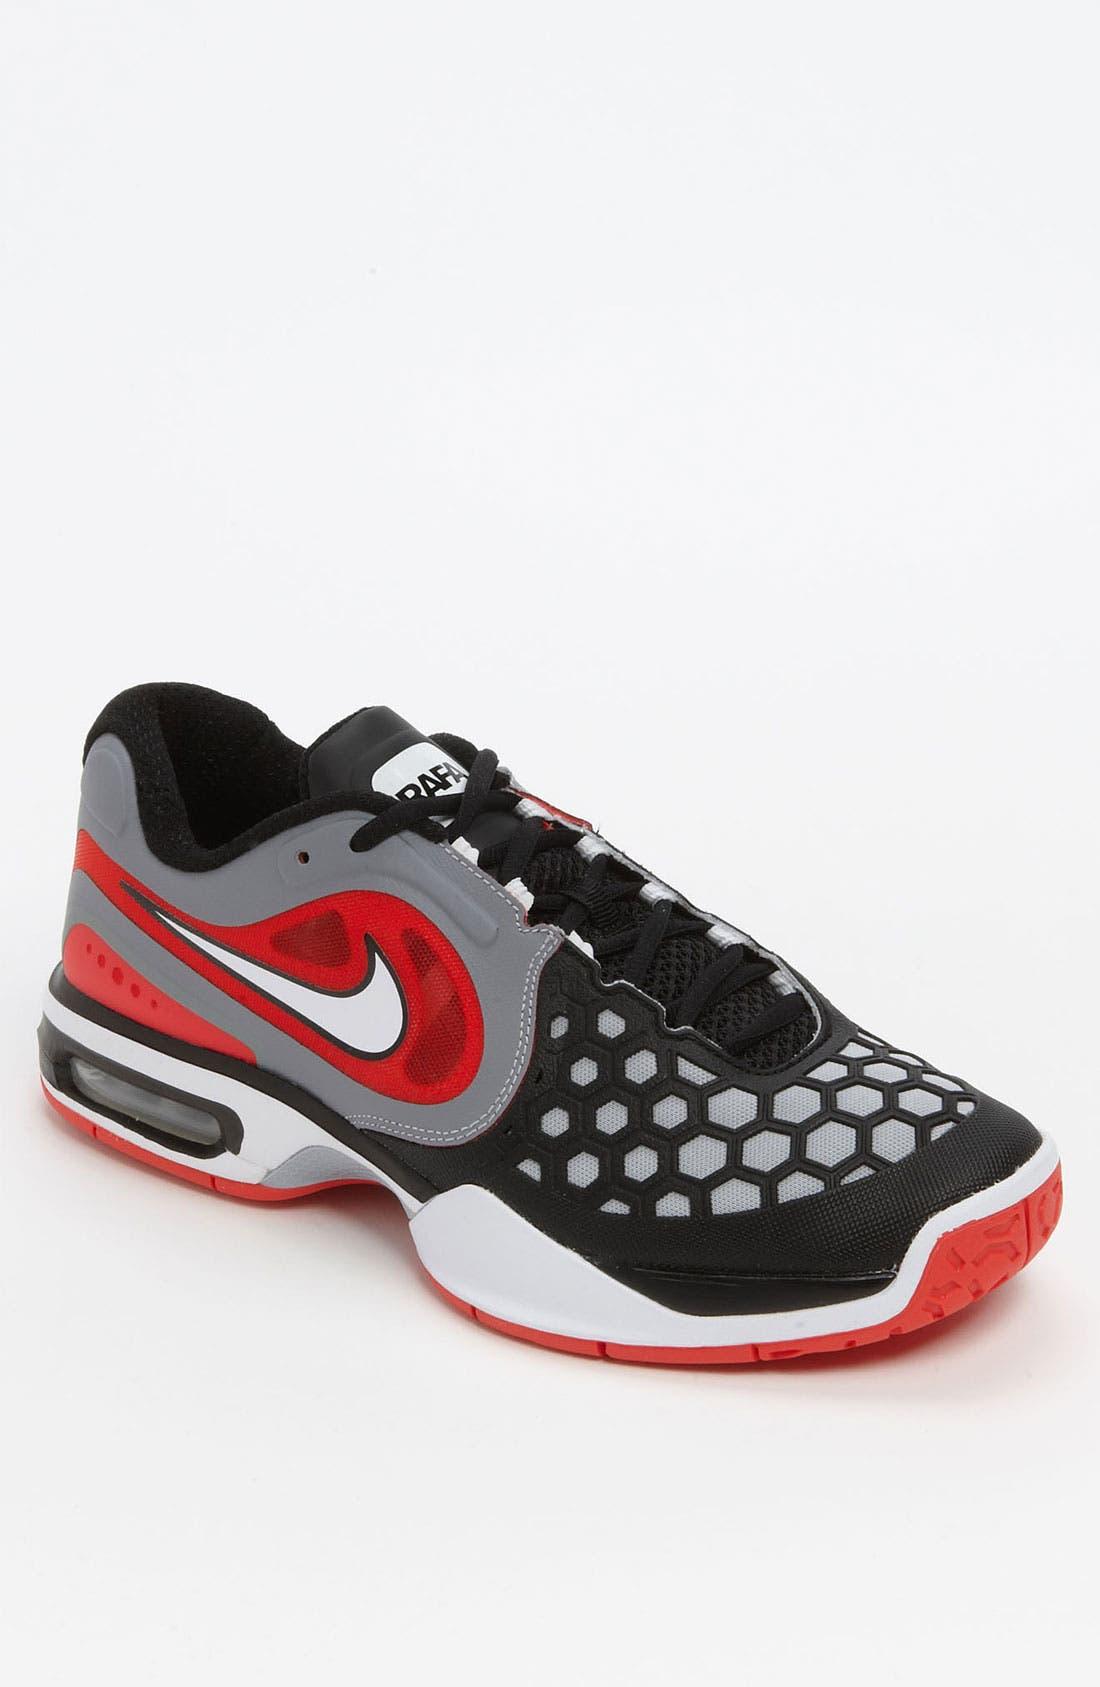 Main Image - Nike 'Air Max Court Ballistec 4.3' Tennis Shoe (Men)